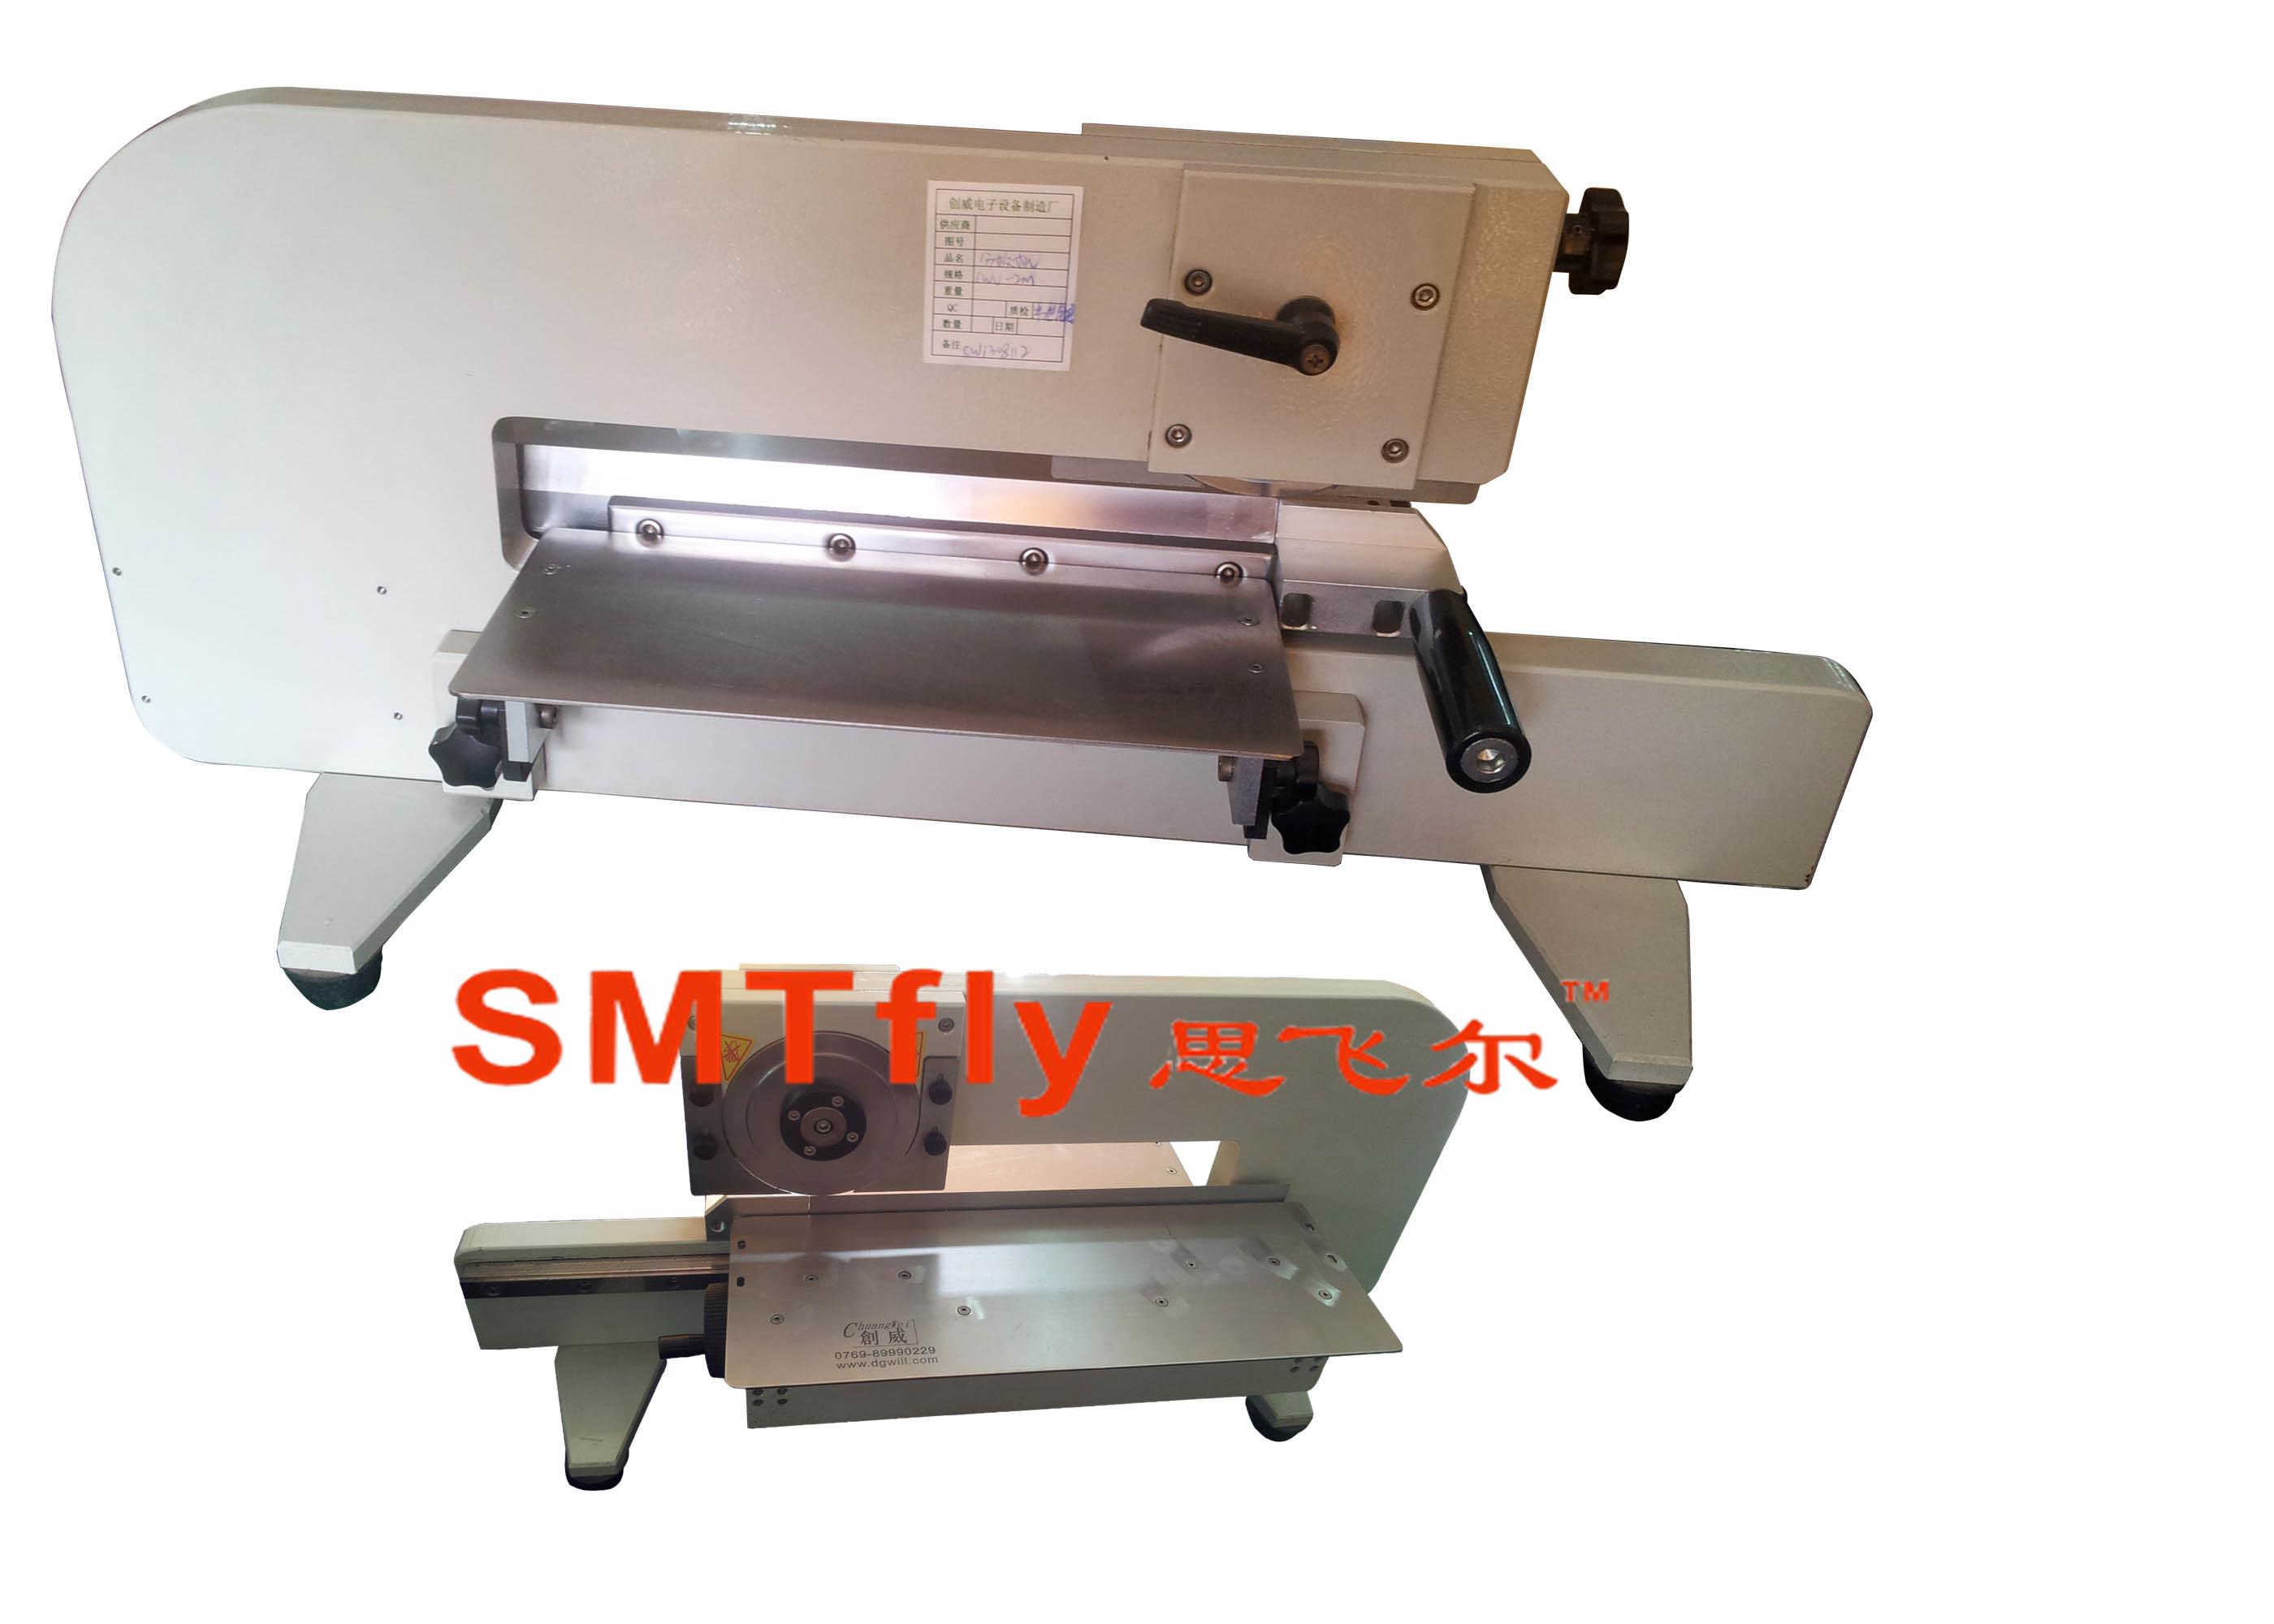 Manul Pcb Depaneling China Automatic V Cut Singulation Machine For Printed Circuit Manual Guillotinesmtfly 2m